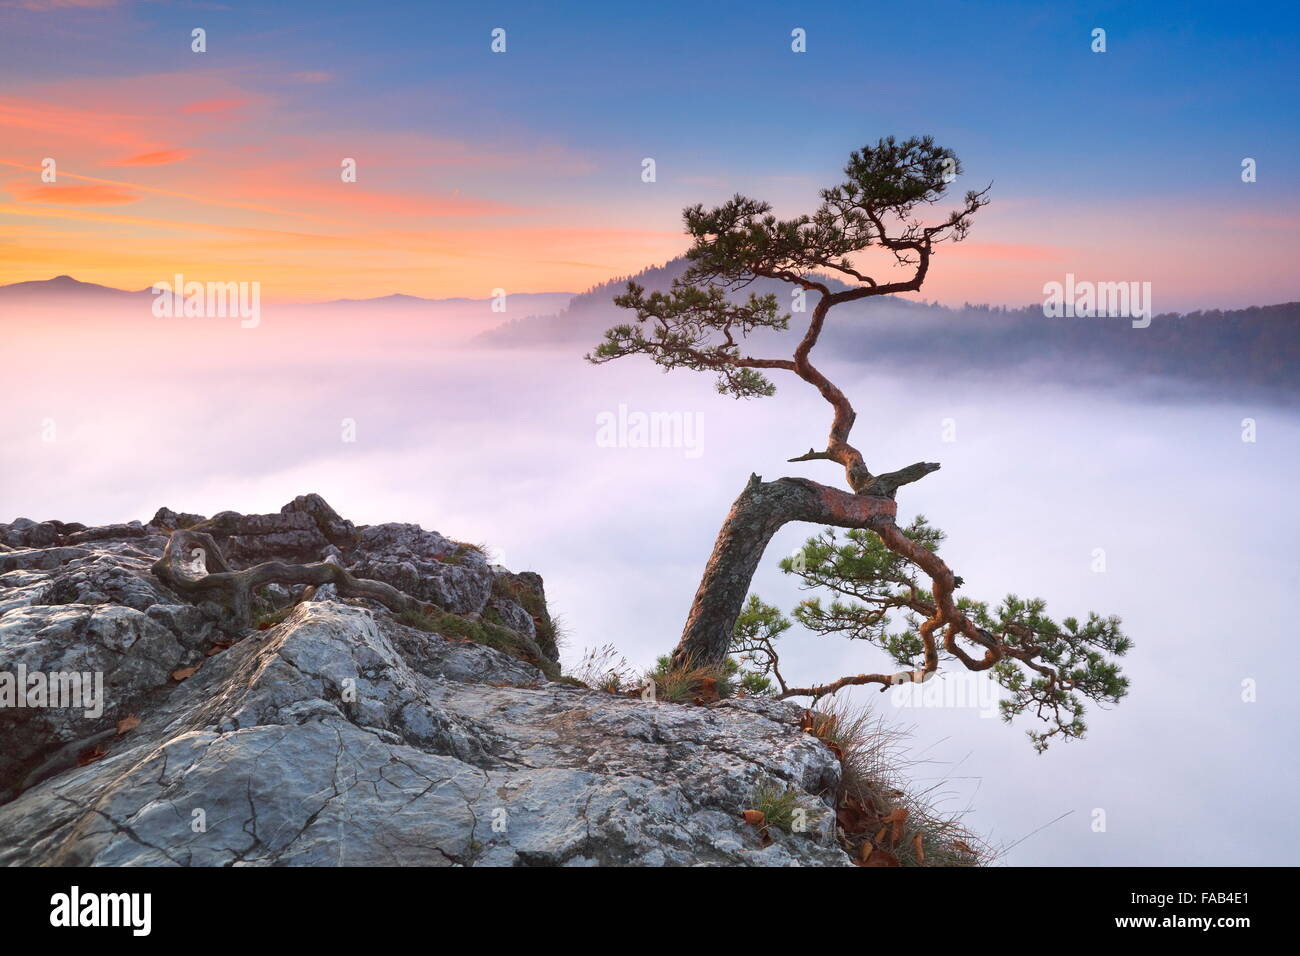 Single alone tree at Pieniny Mountains, Poland - Stock Image